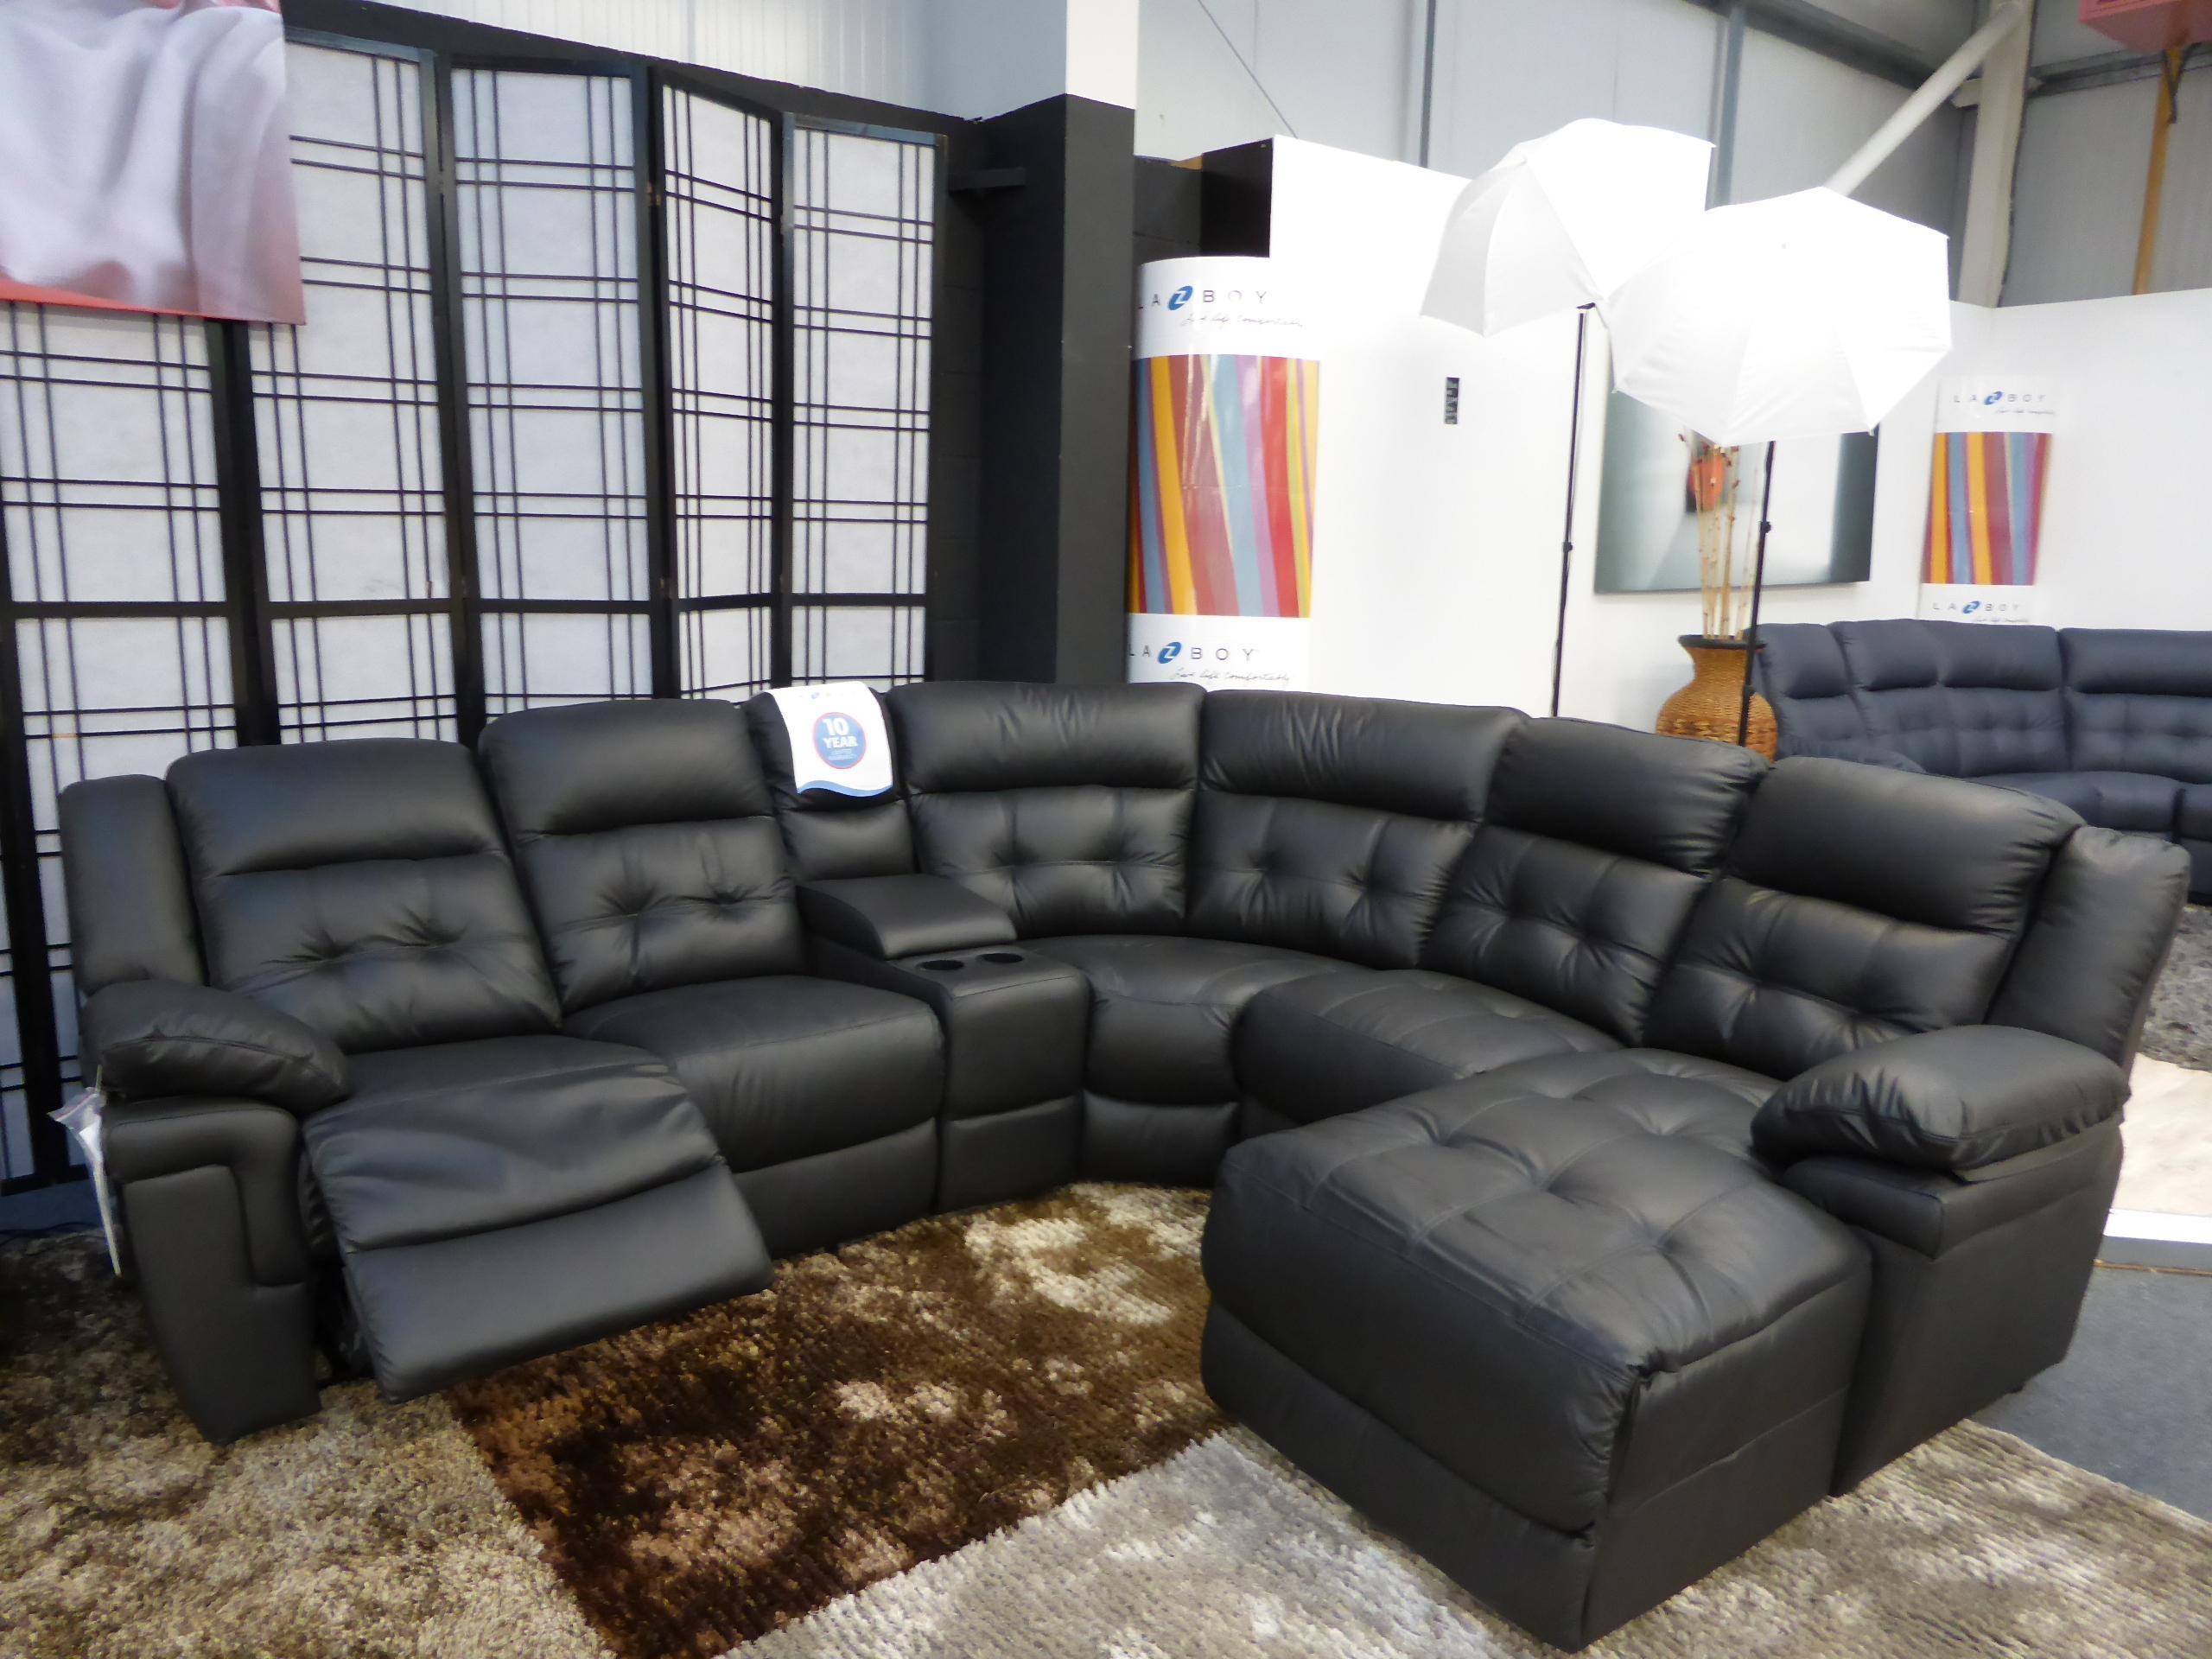 Lazy Boy Sofa Recliners Prices | Tehranmix Decoration Inside Lazy Boy Manhattan Sofas (Image 13 of 21)